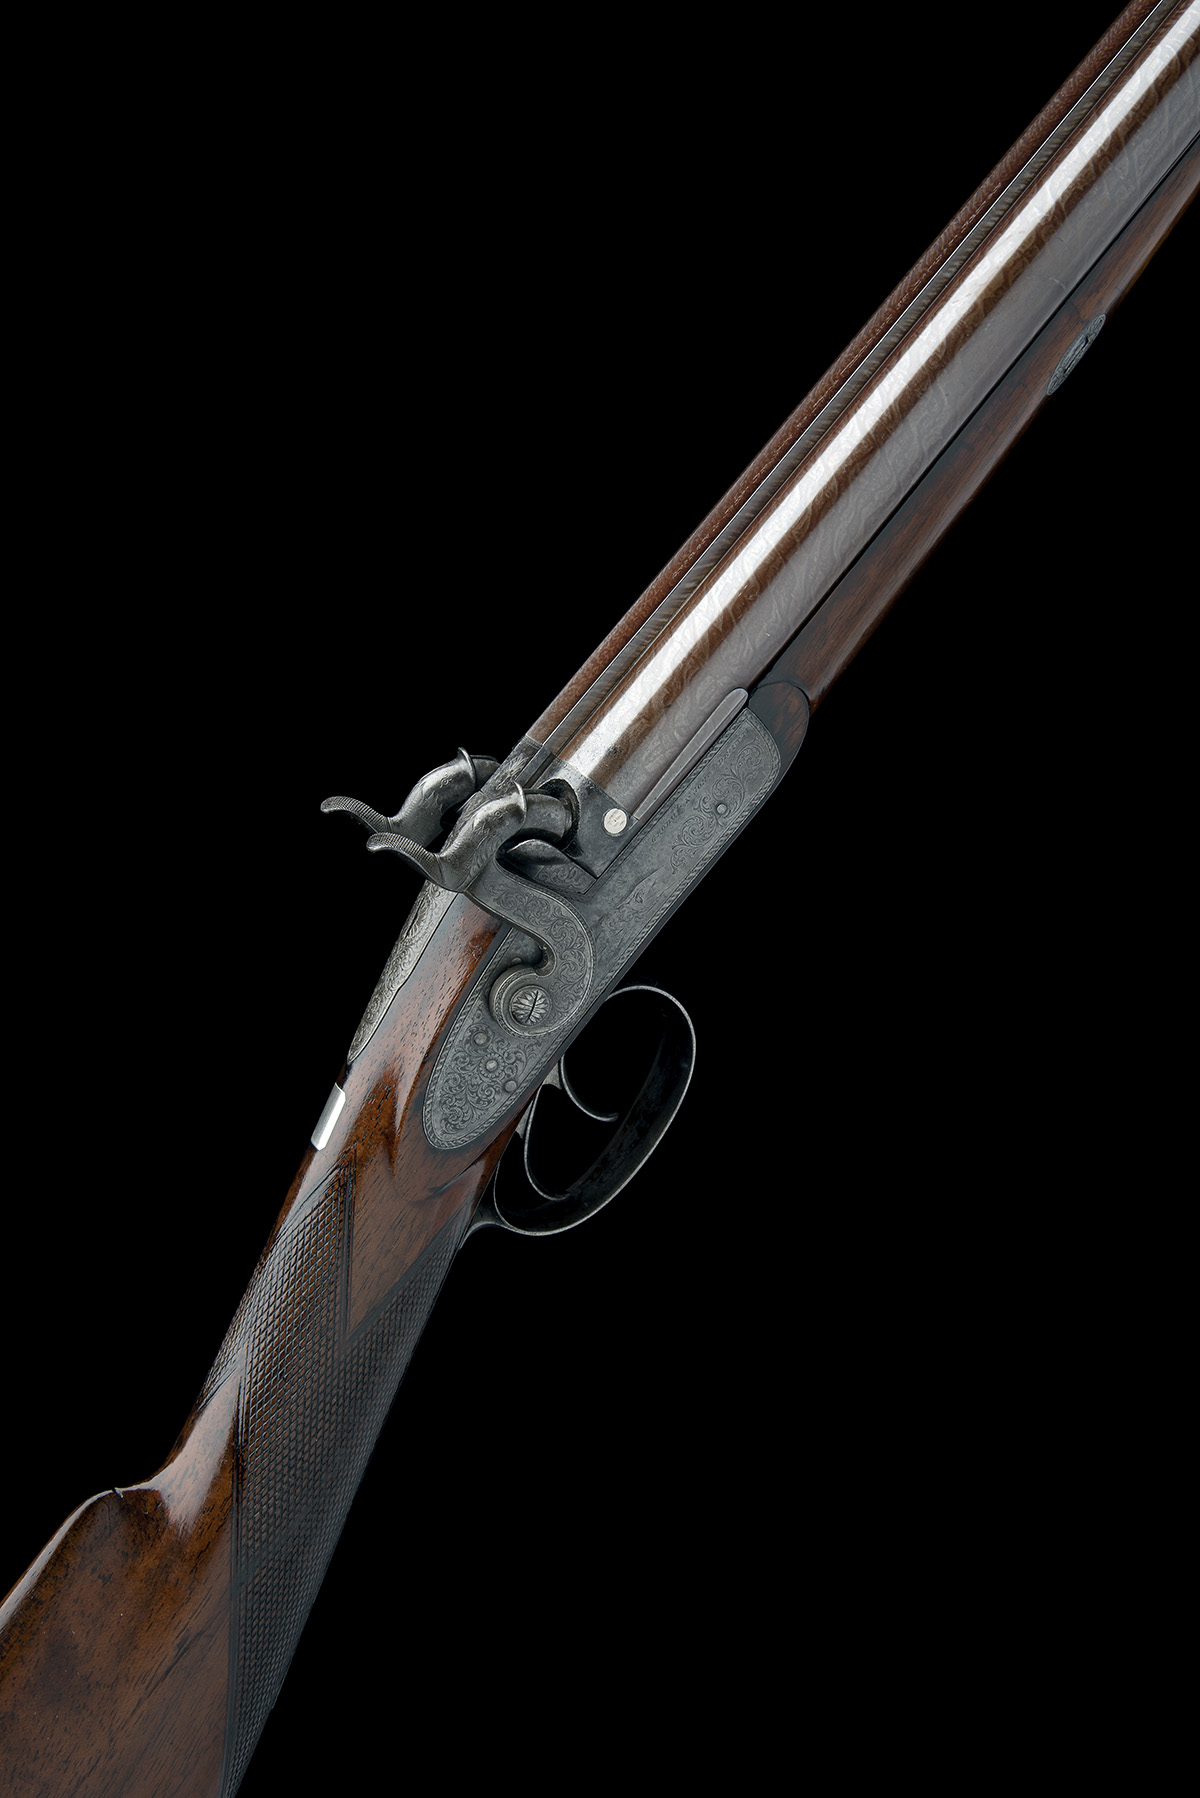 G & J DEAN, LONDON A FINE 16-BORE PERCUSSION DOUBLE-BARRELLED SPORTING-GUN, serial no. 6201, circa